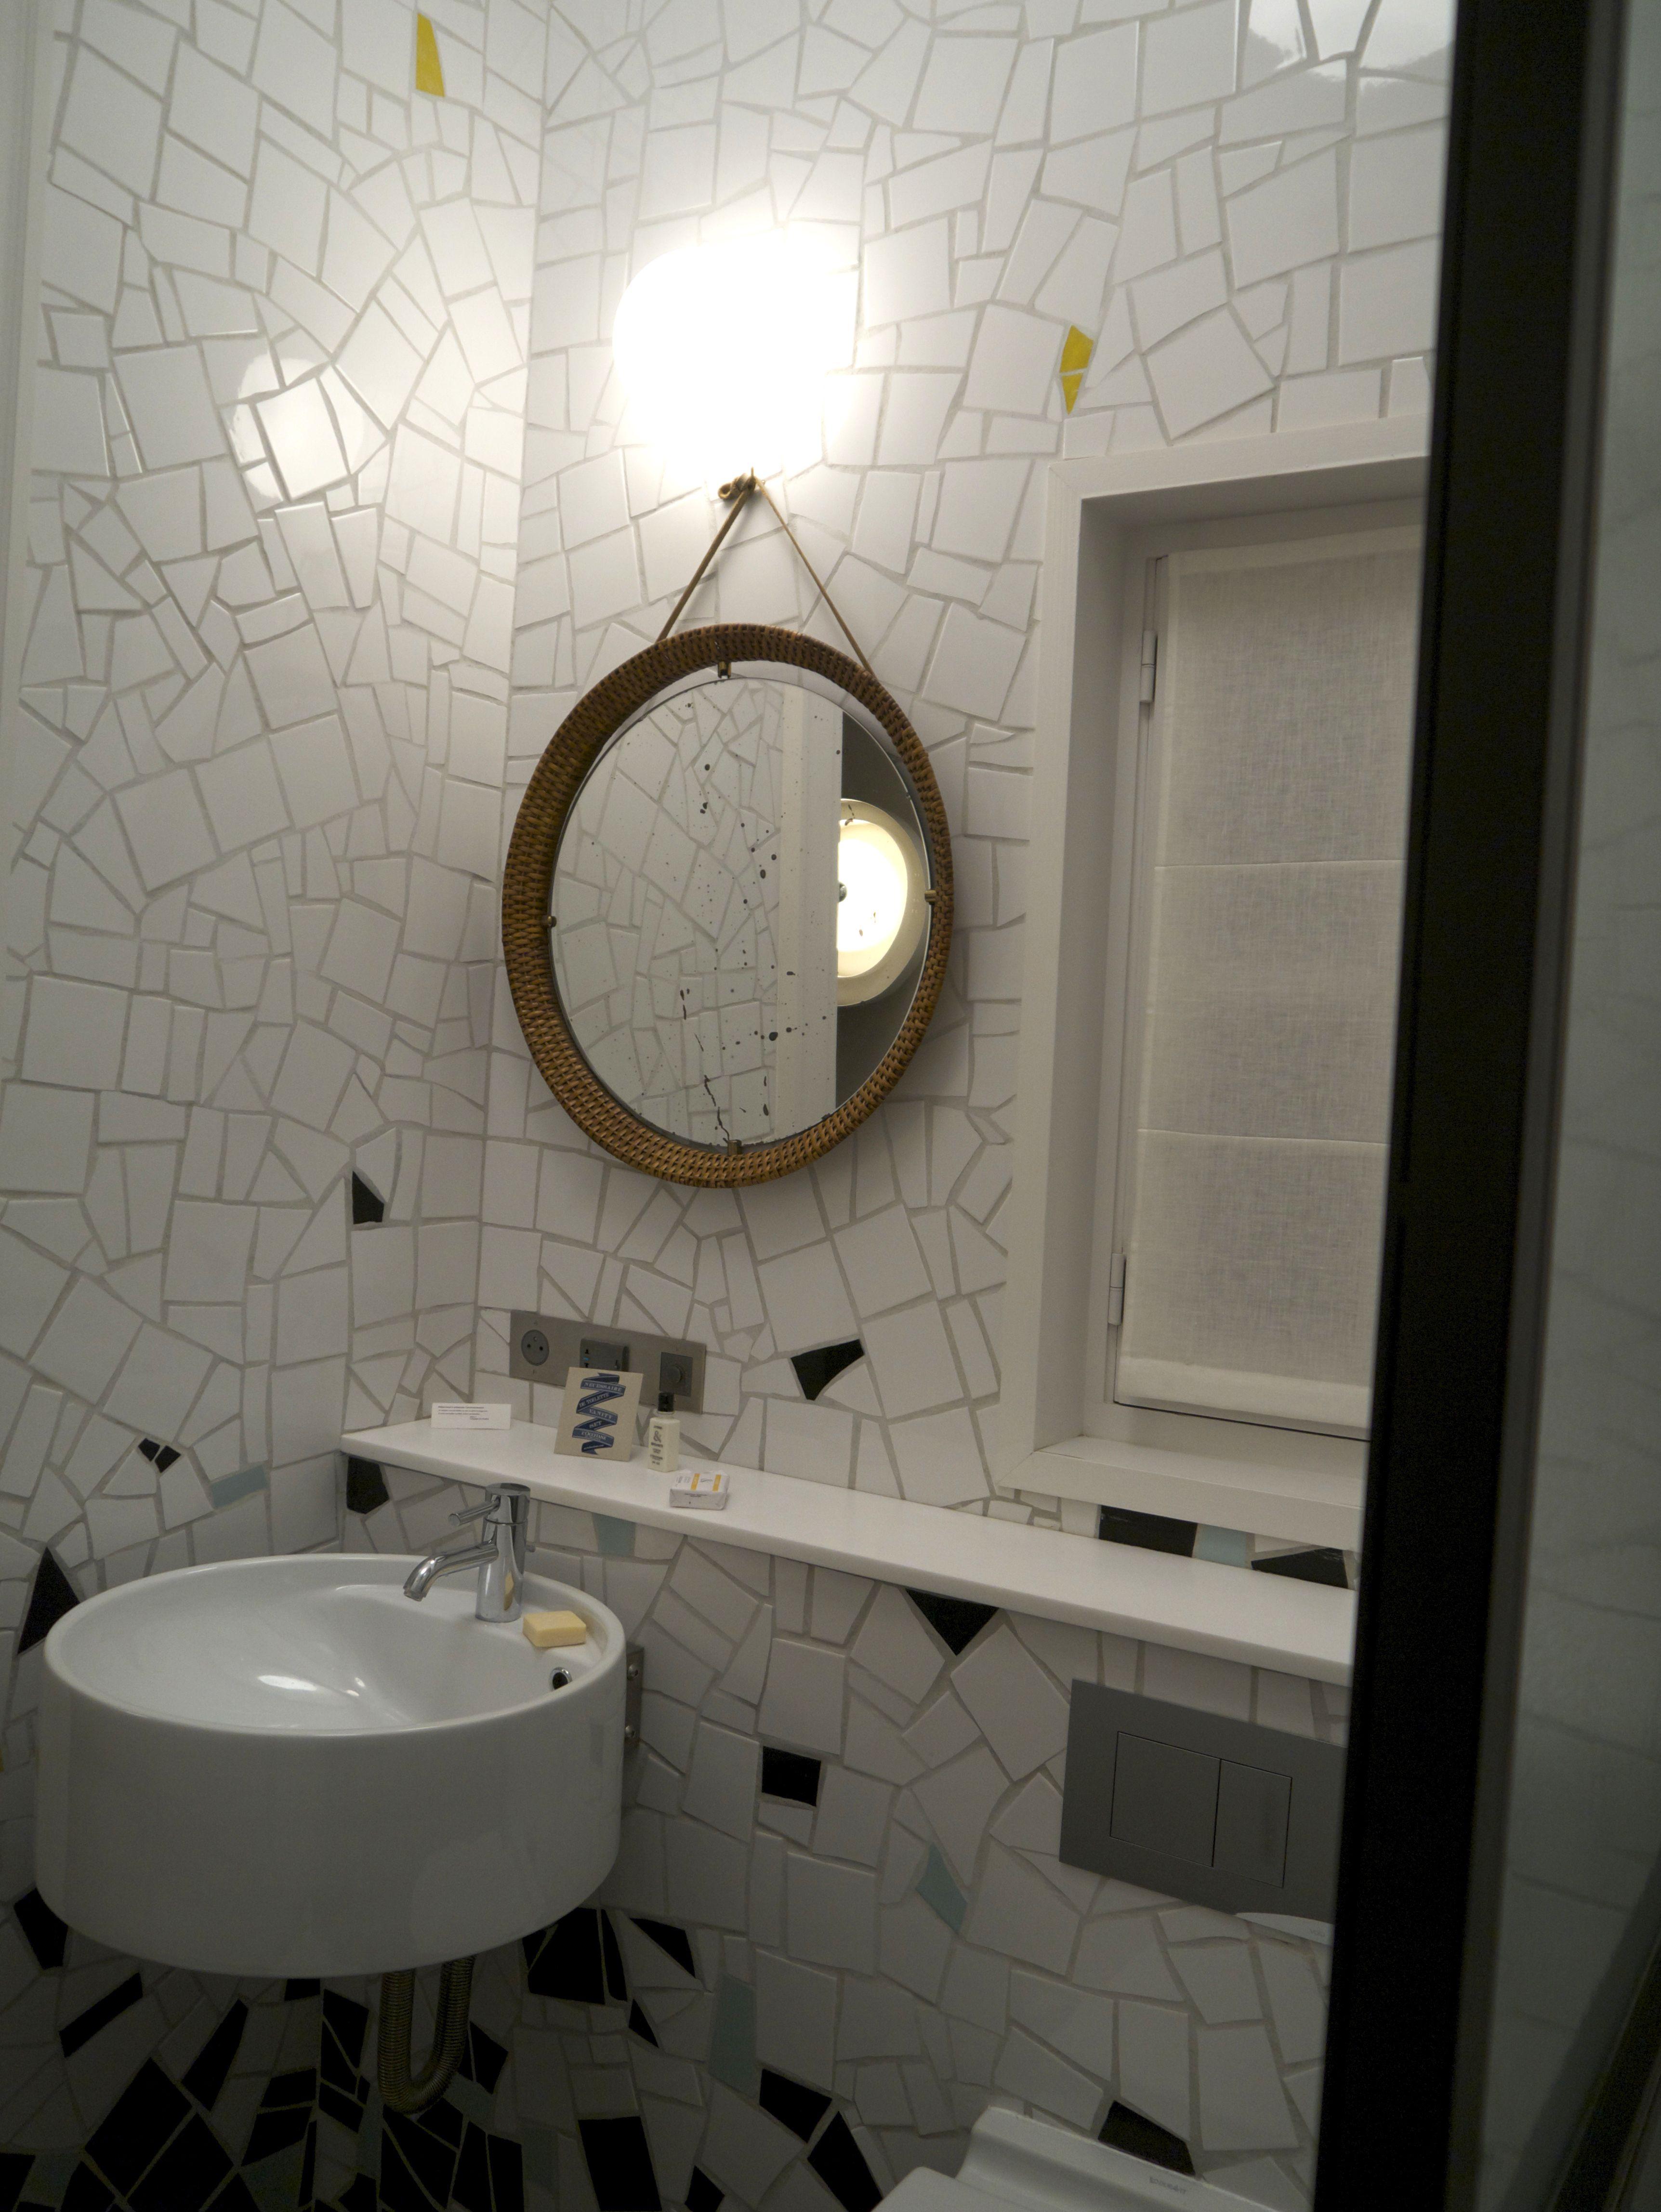 h tel du clo tre arles design india mahdavi for the. Black Bedroom Furniture Sets. Home Design Ideas